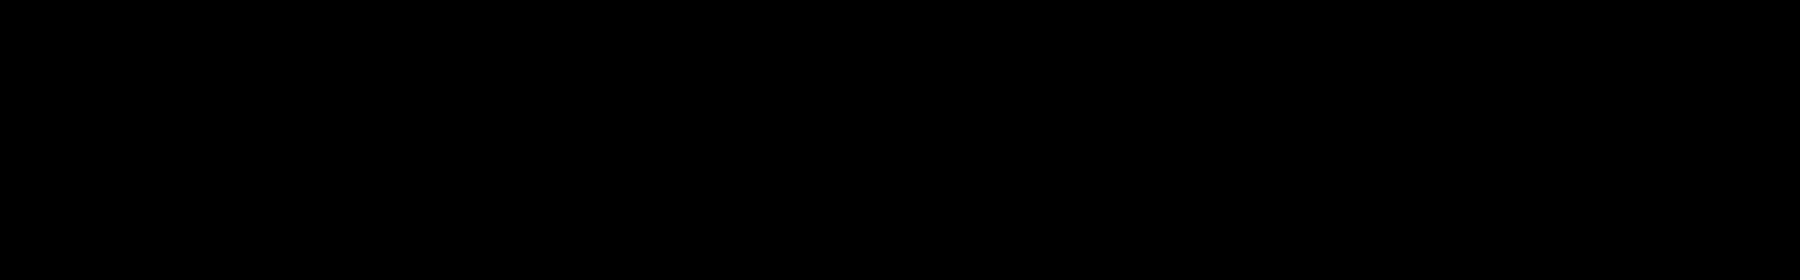 Psy Trance MIDI Loops 2 audio waveform